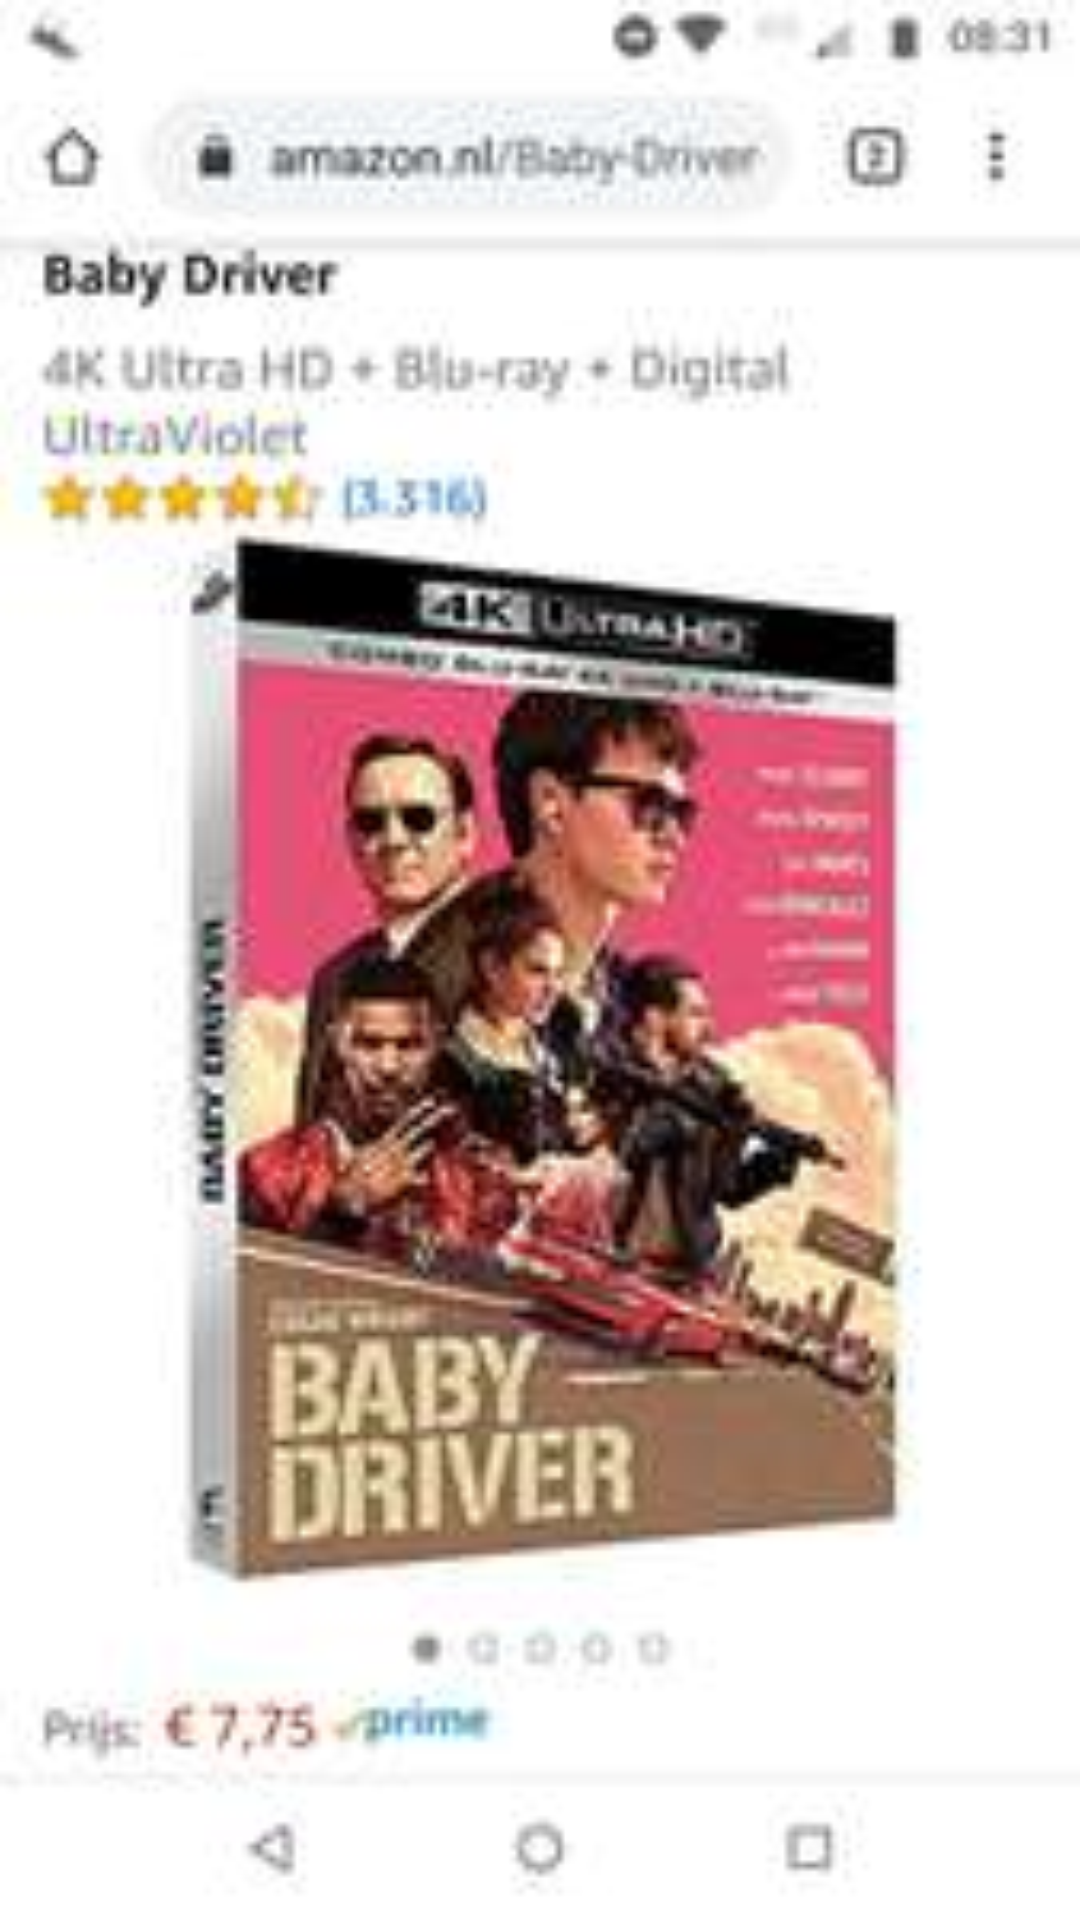 Baby Driver 4K - €7,75 @ Amazon.nl